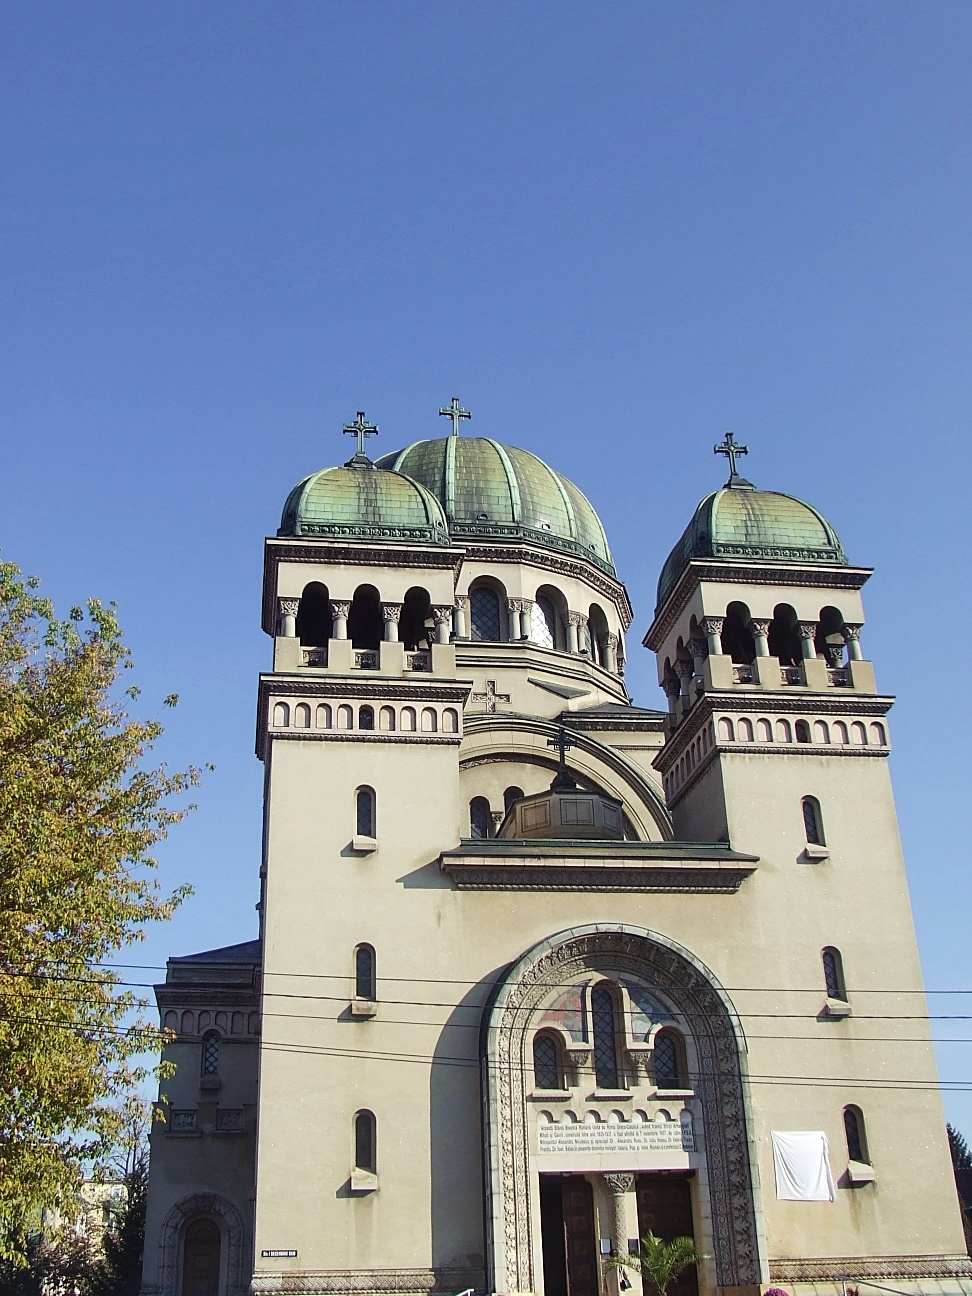 Catedrala greco-catolică Sfinții. Arhangheli Mihail și Gavril